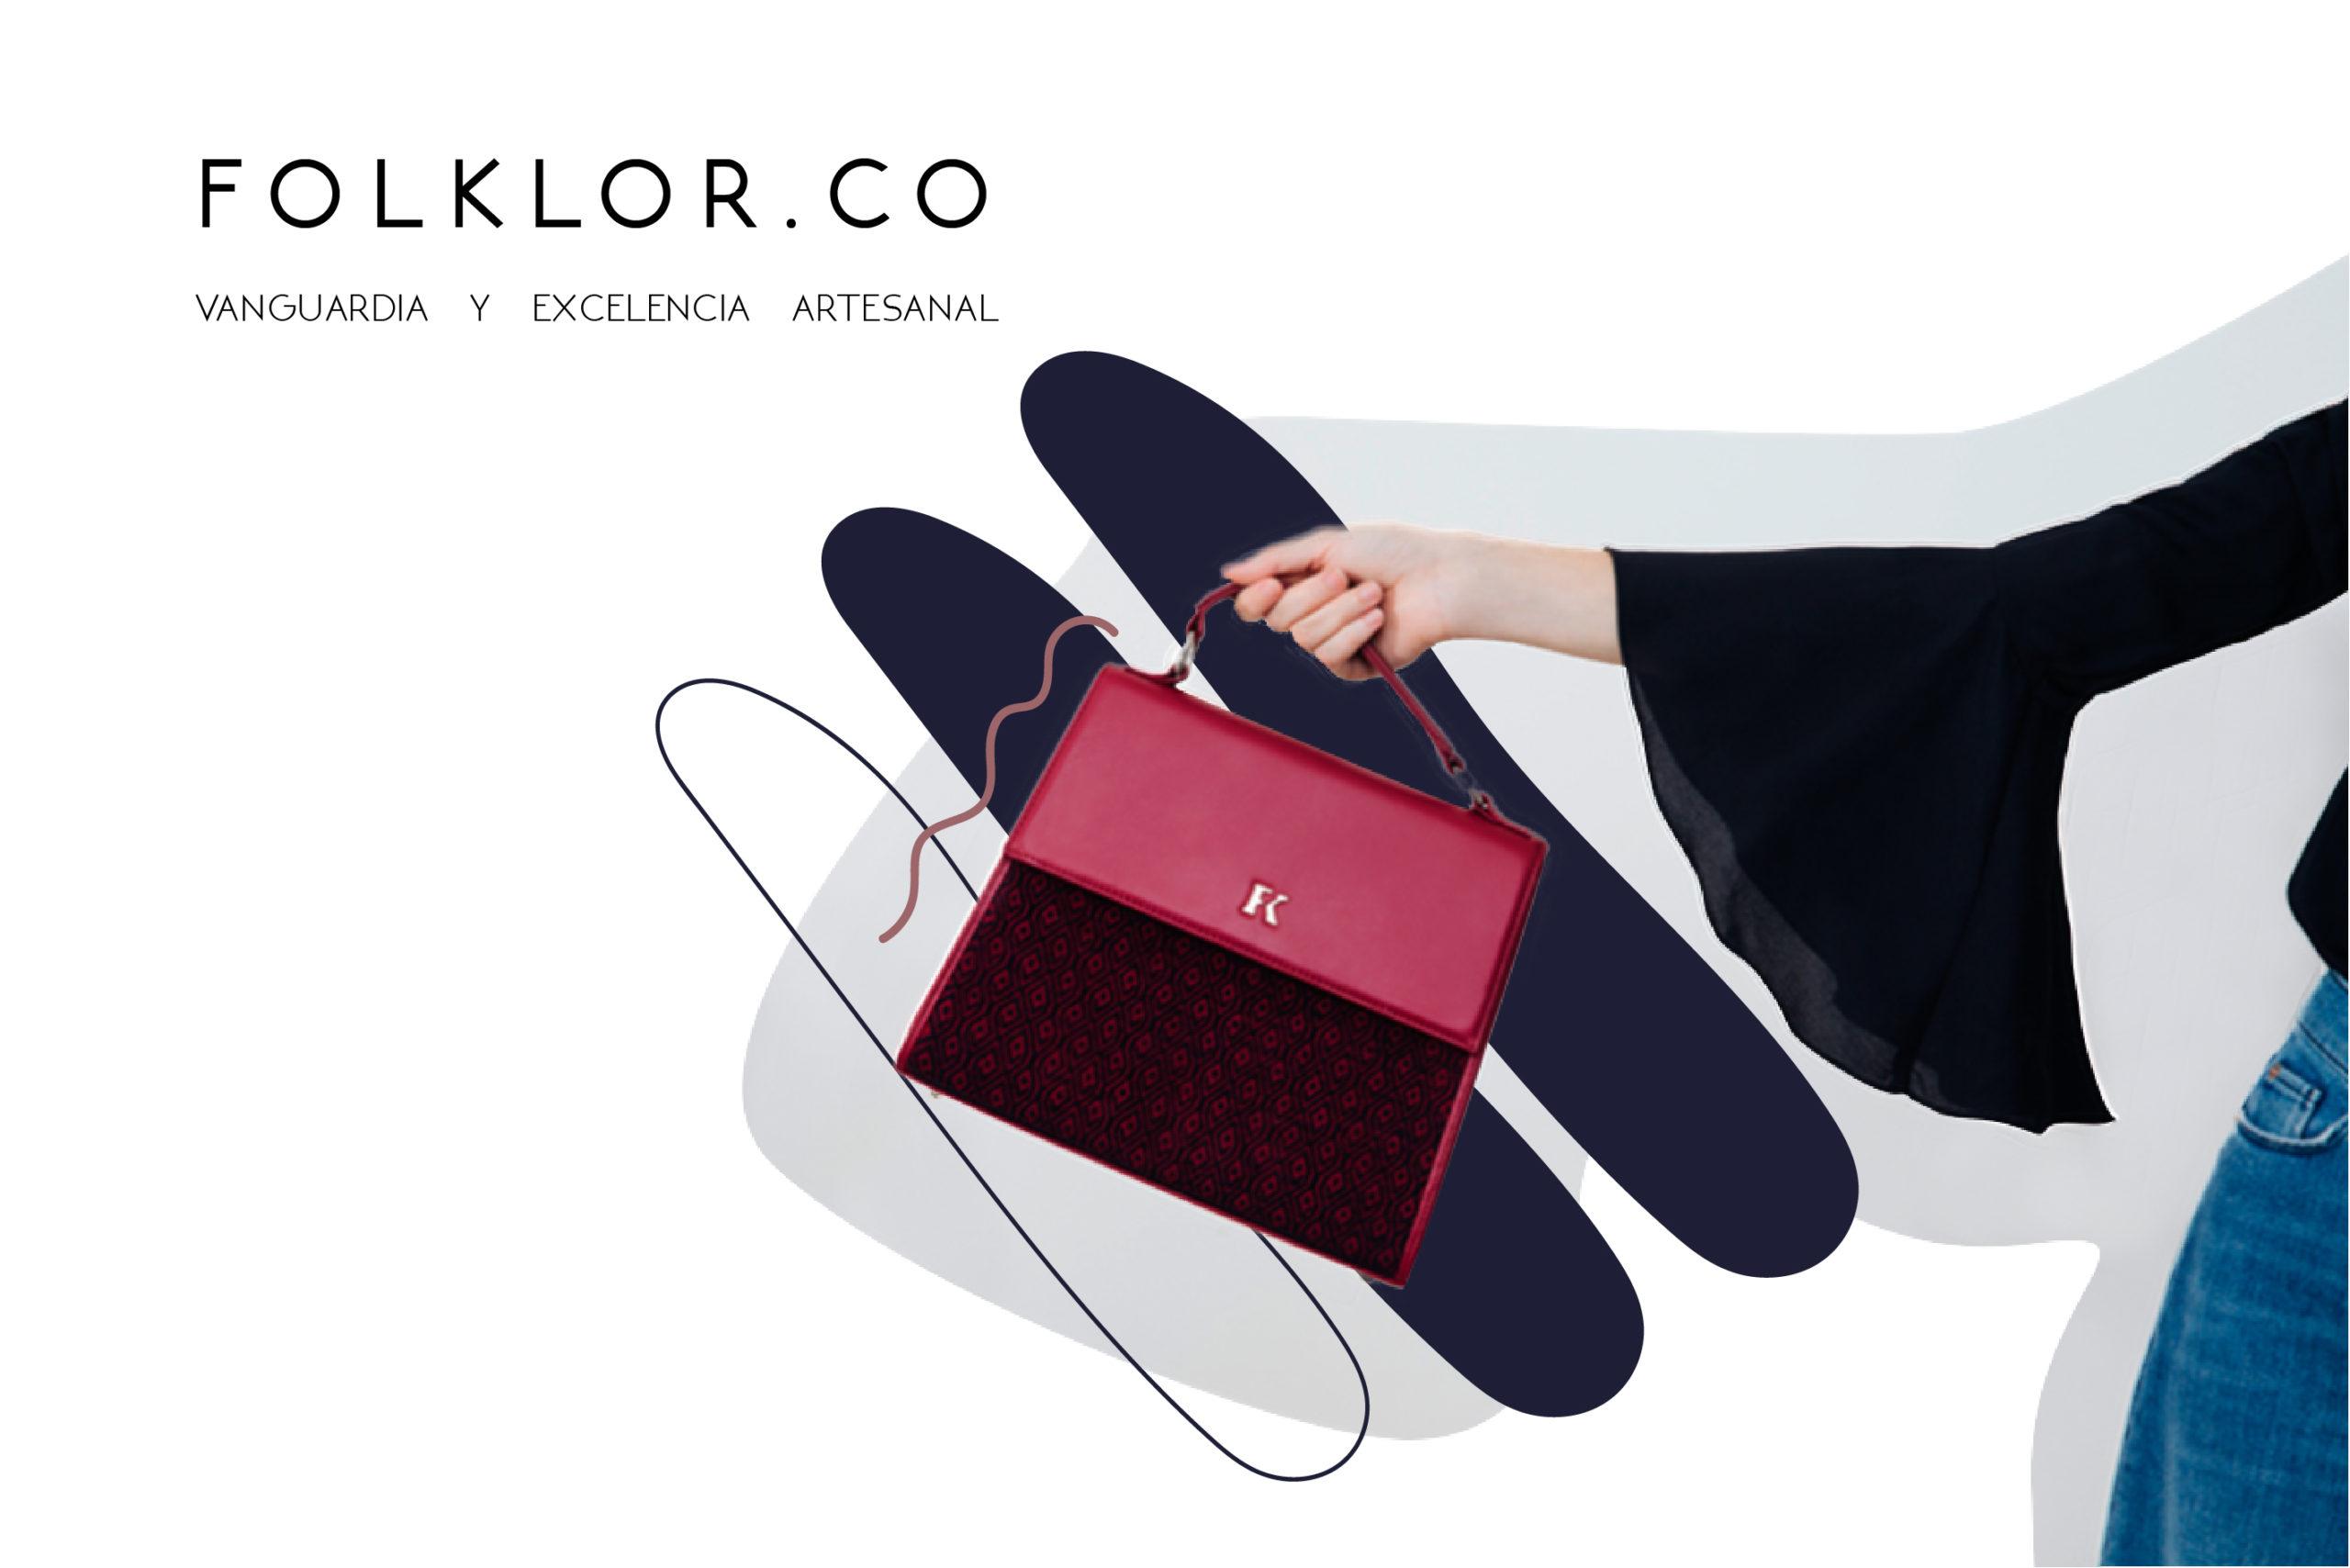 FOLKLOR.co. Vanguardia y excelencia artesanal